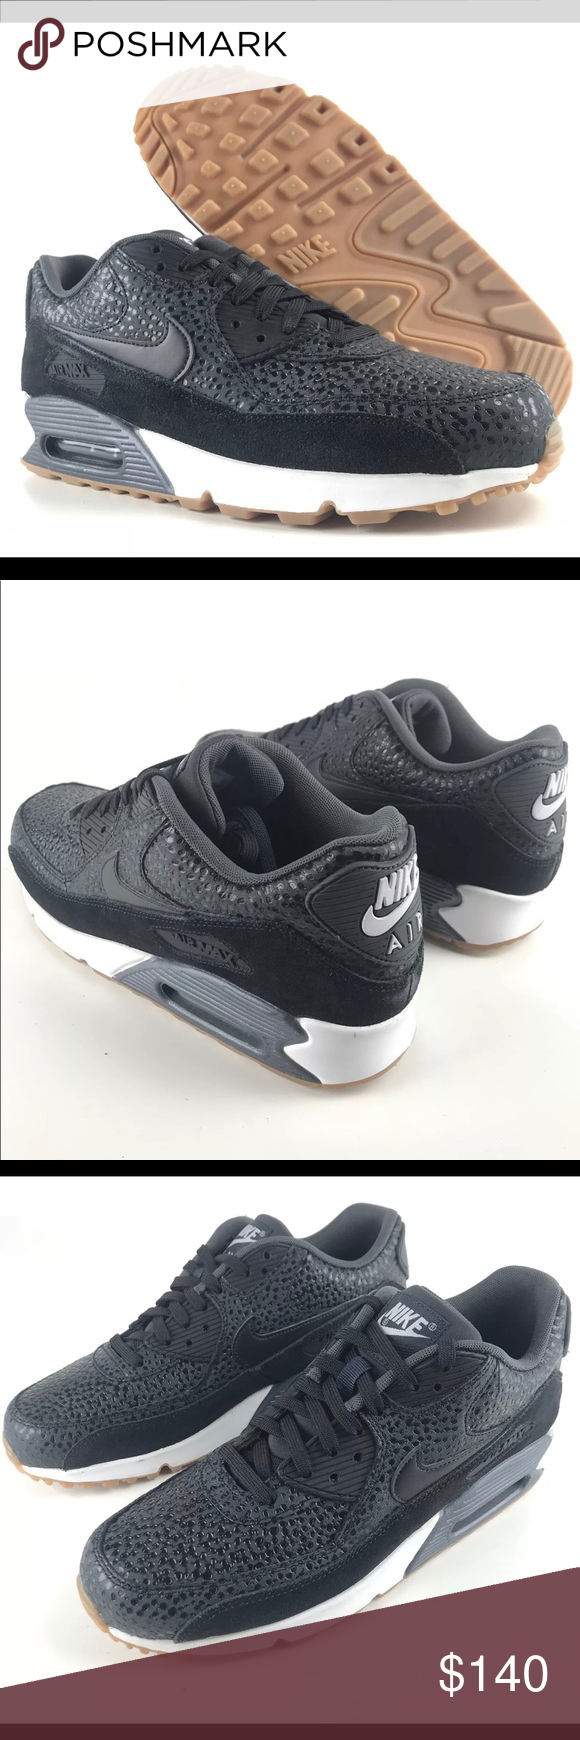 5a0bf55ef174 Nike Air Max 90 Premium Black Safari Gum Bottom Nike Air Max 90 Premium  Black Safari Gum Bottom Size 12 US Women s 443817 Rare Brand new